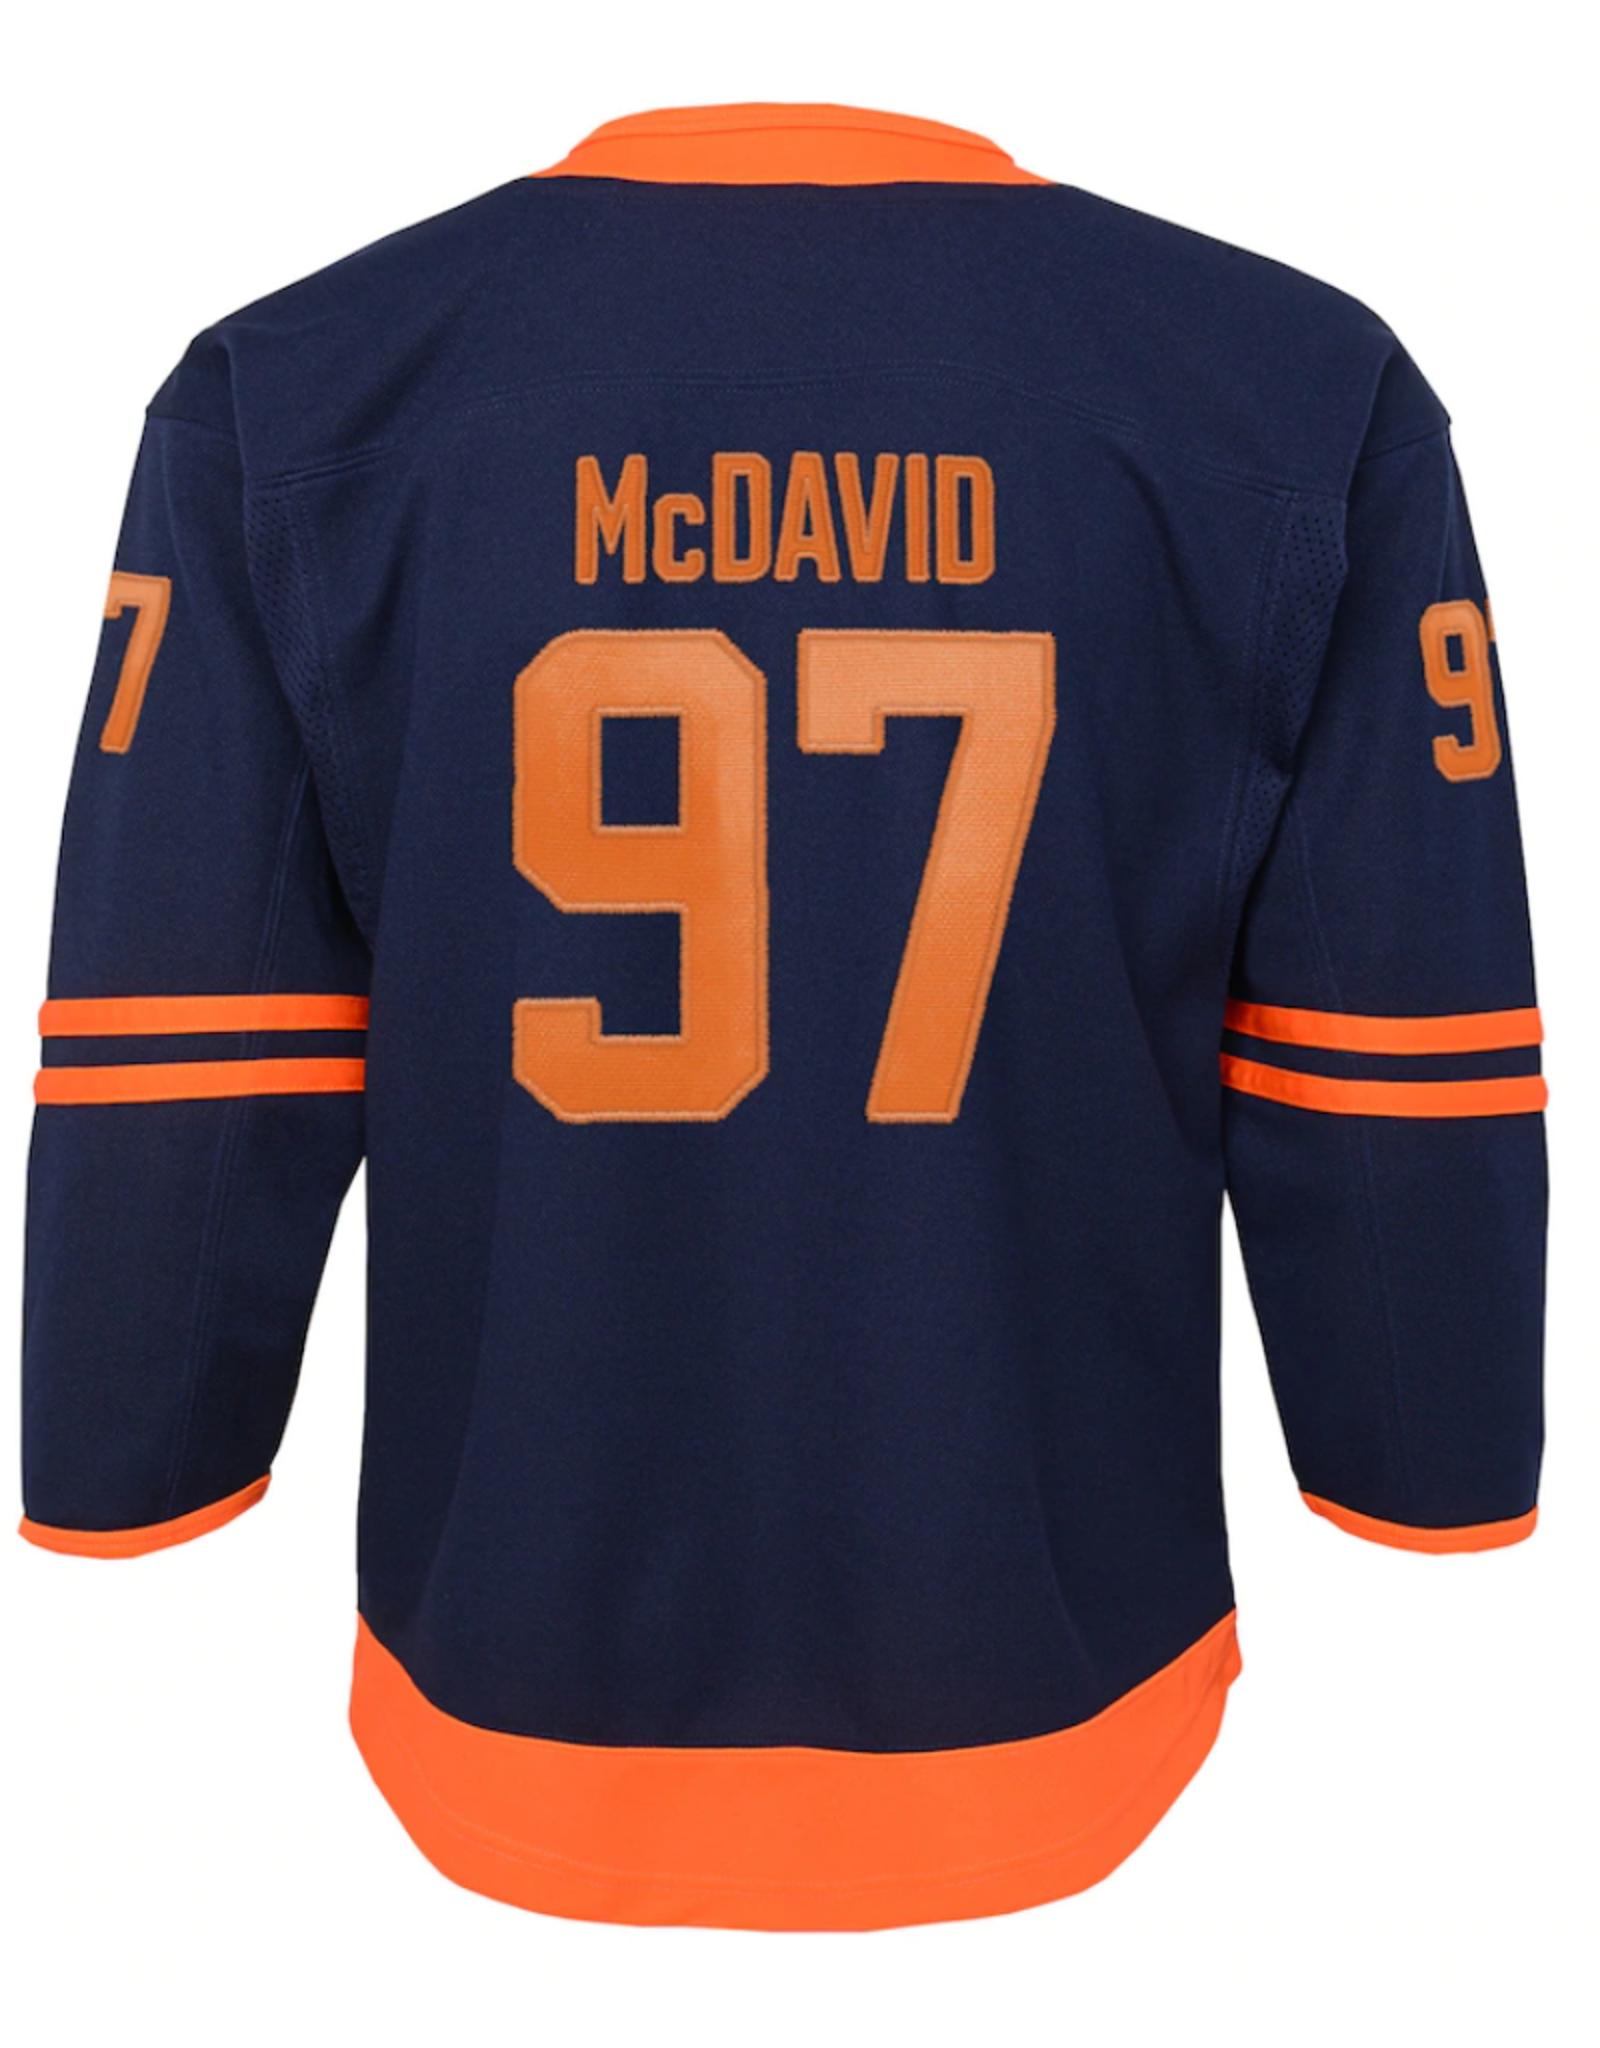 NHL Youth Premier Alternate McDavid 97 Edmonton Oilers Navy